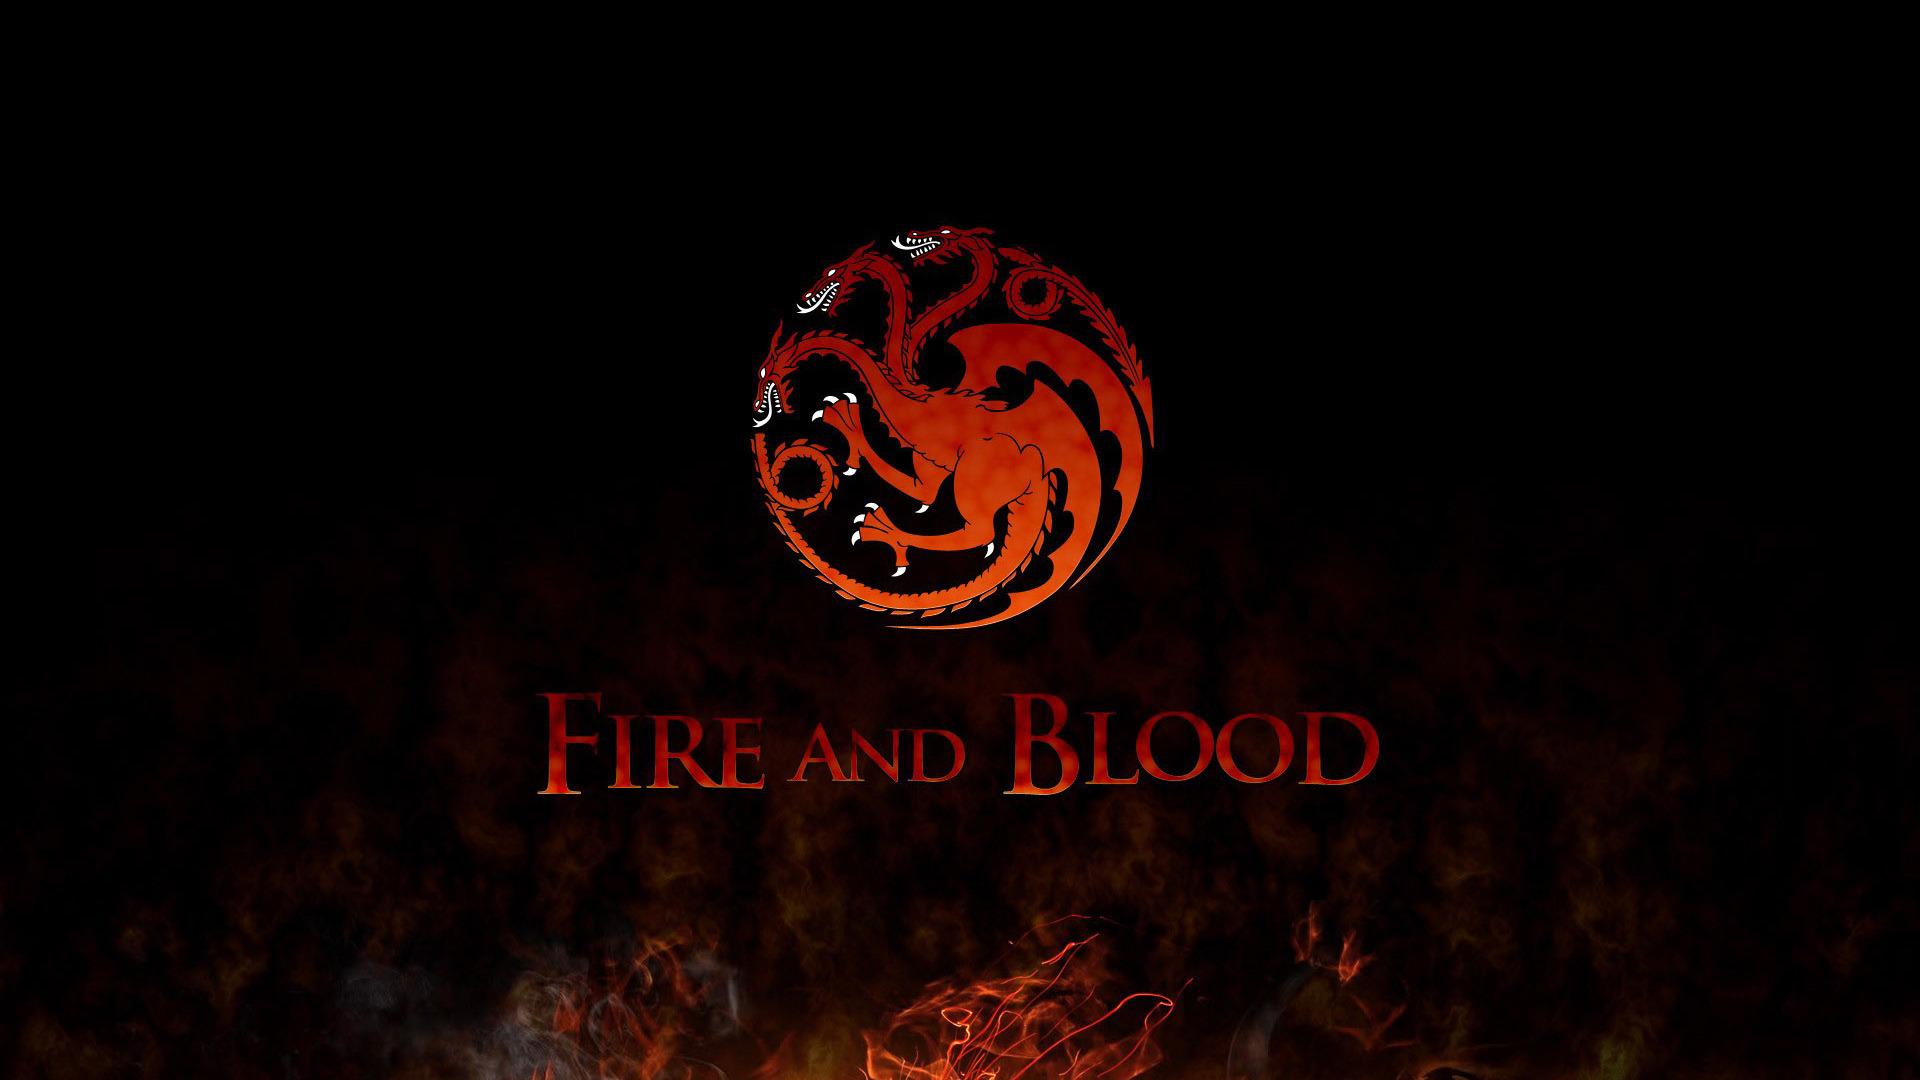 Targaryen sigil wallpaper wallpapersafari for House of wallpaper